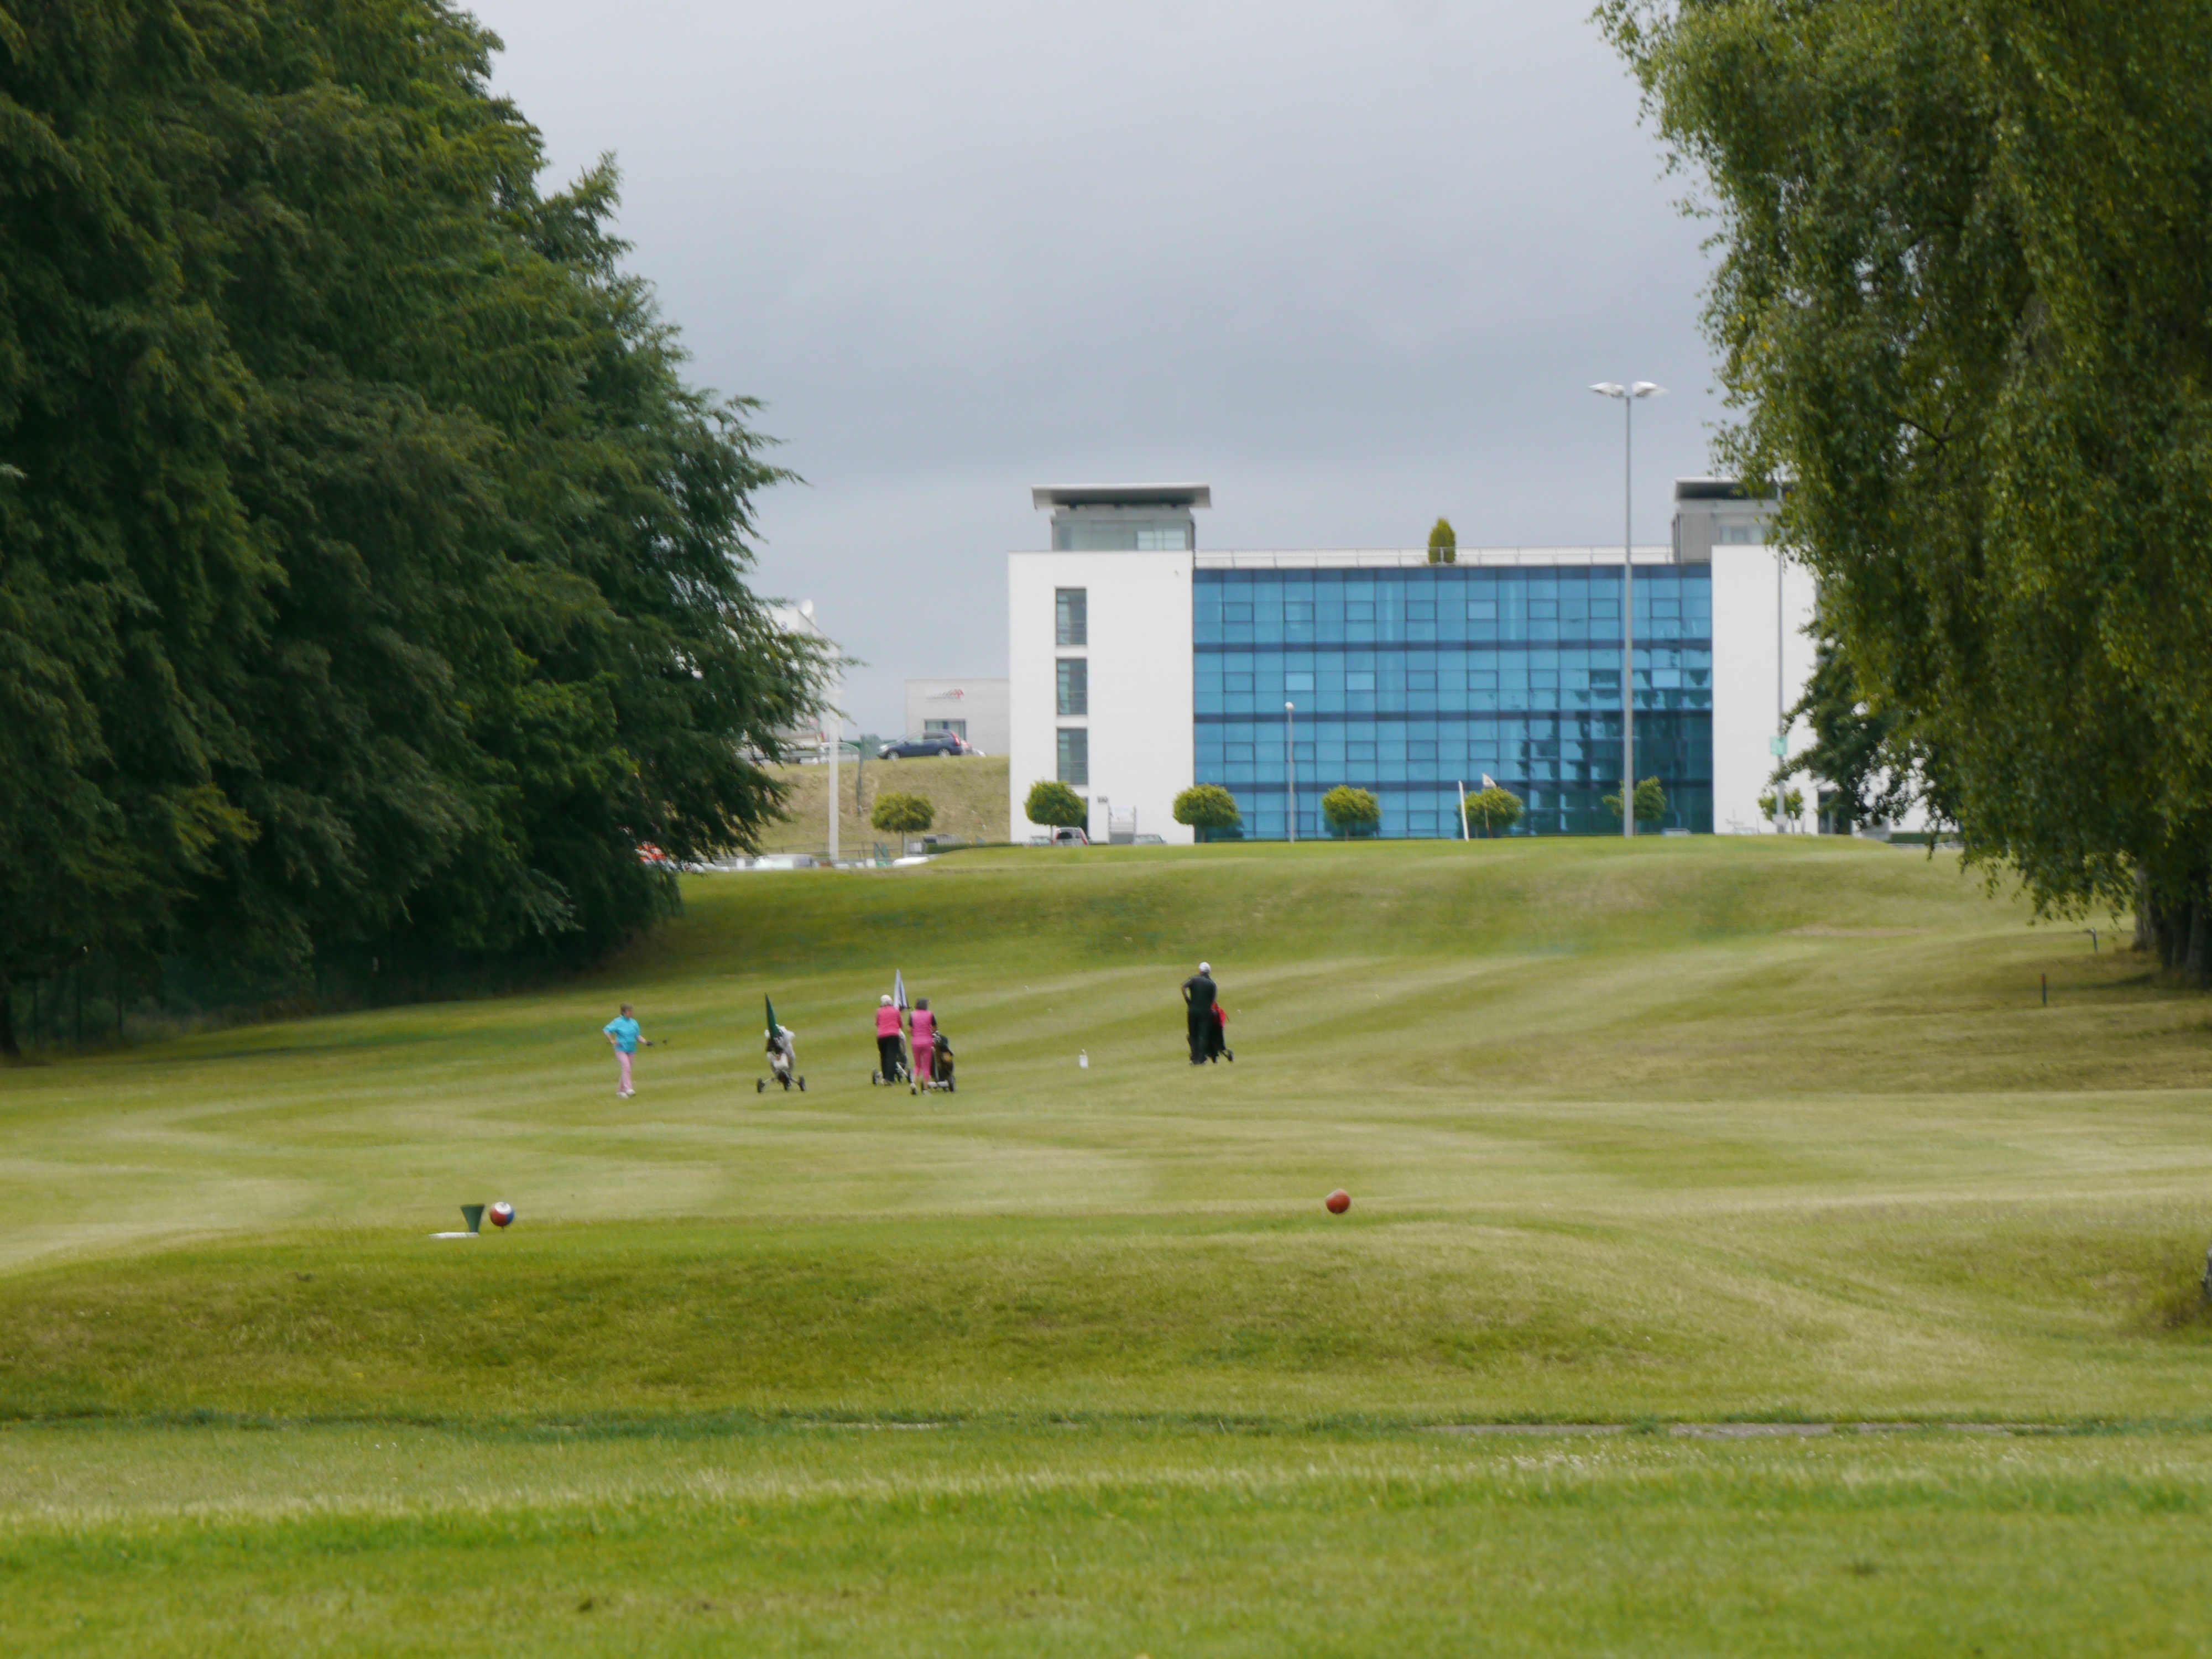 Foto: Golf Club Hahn e.V.